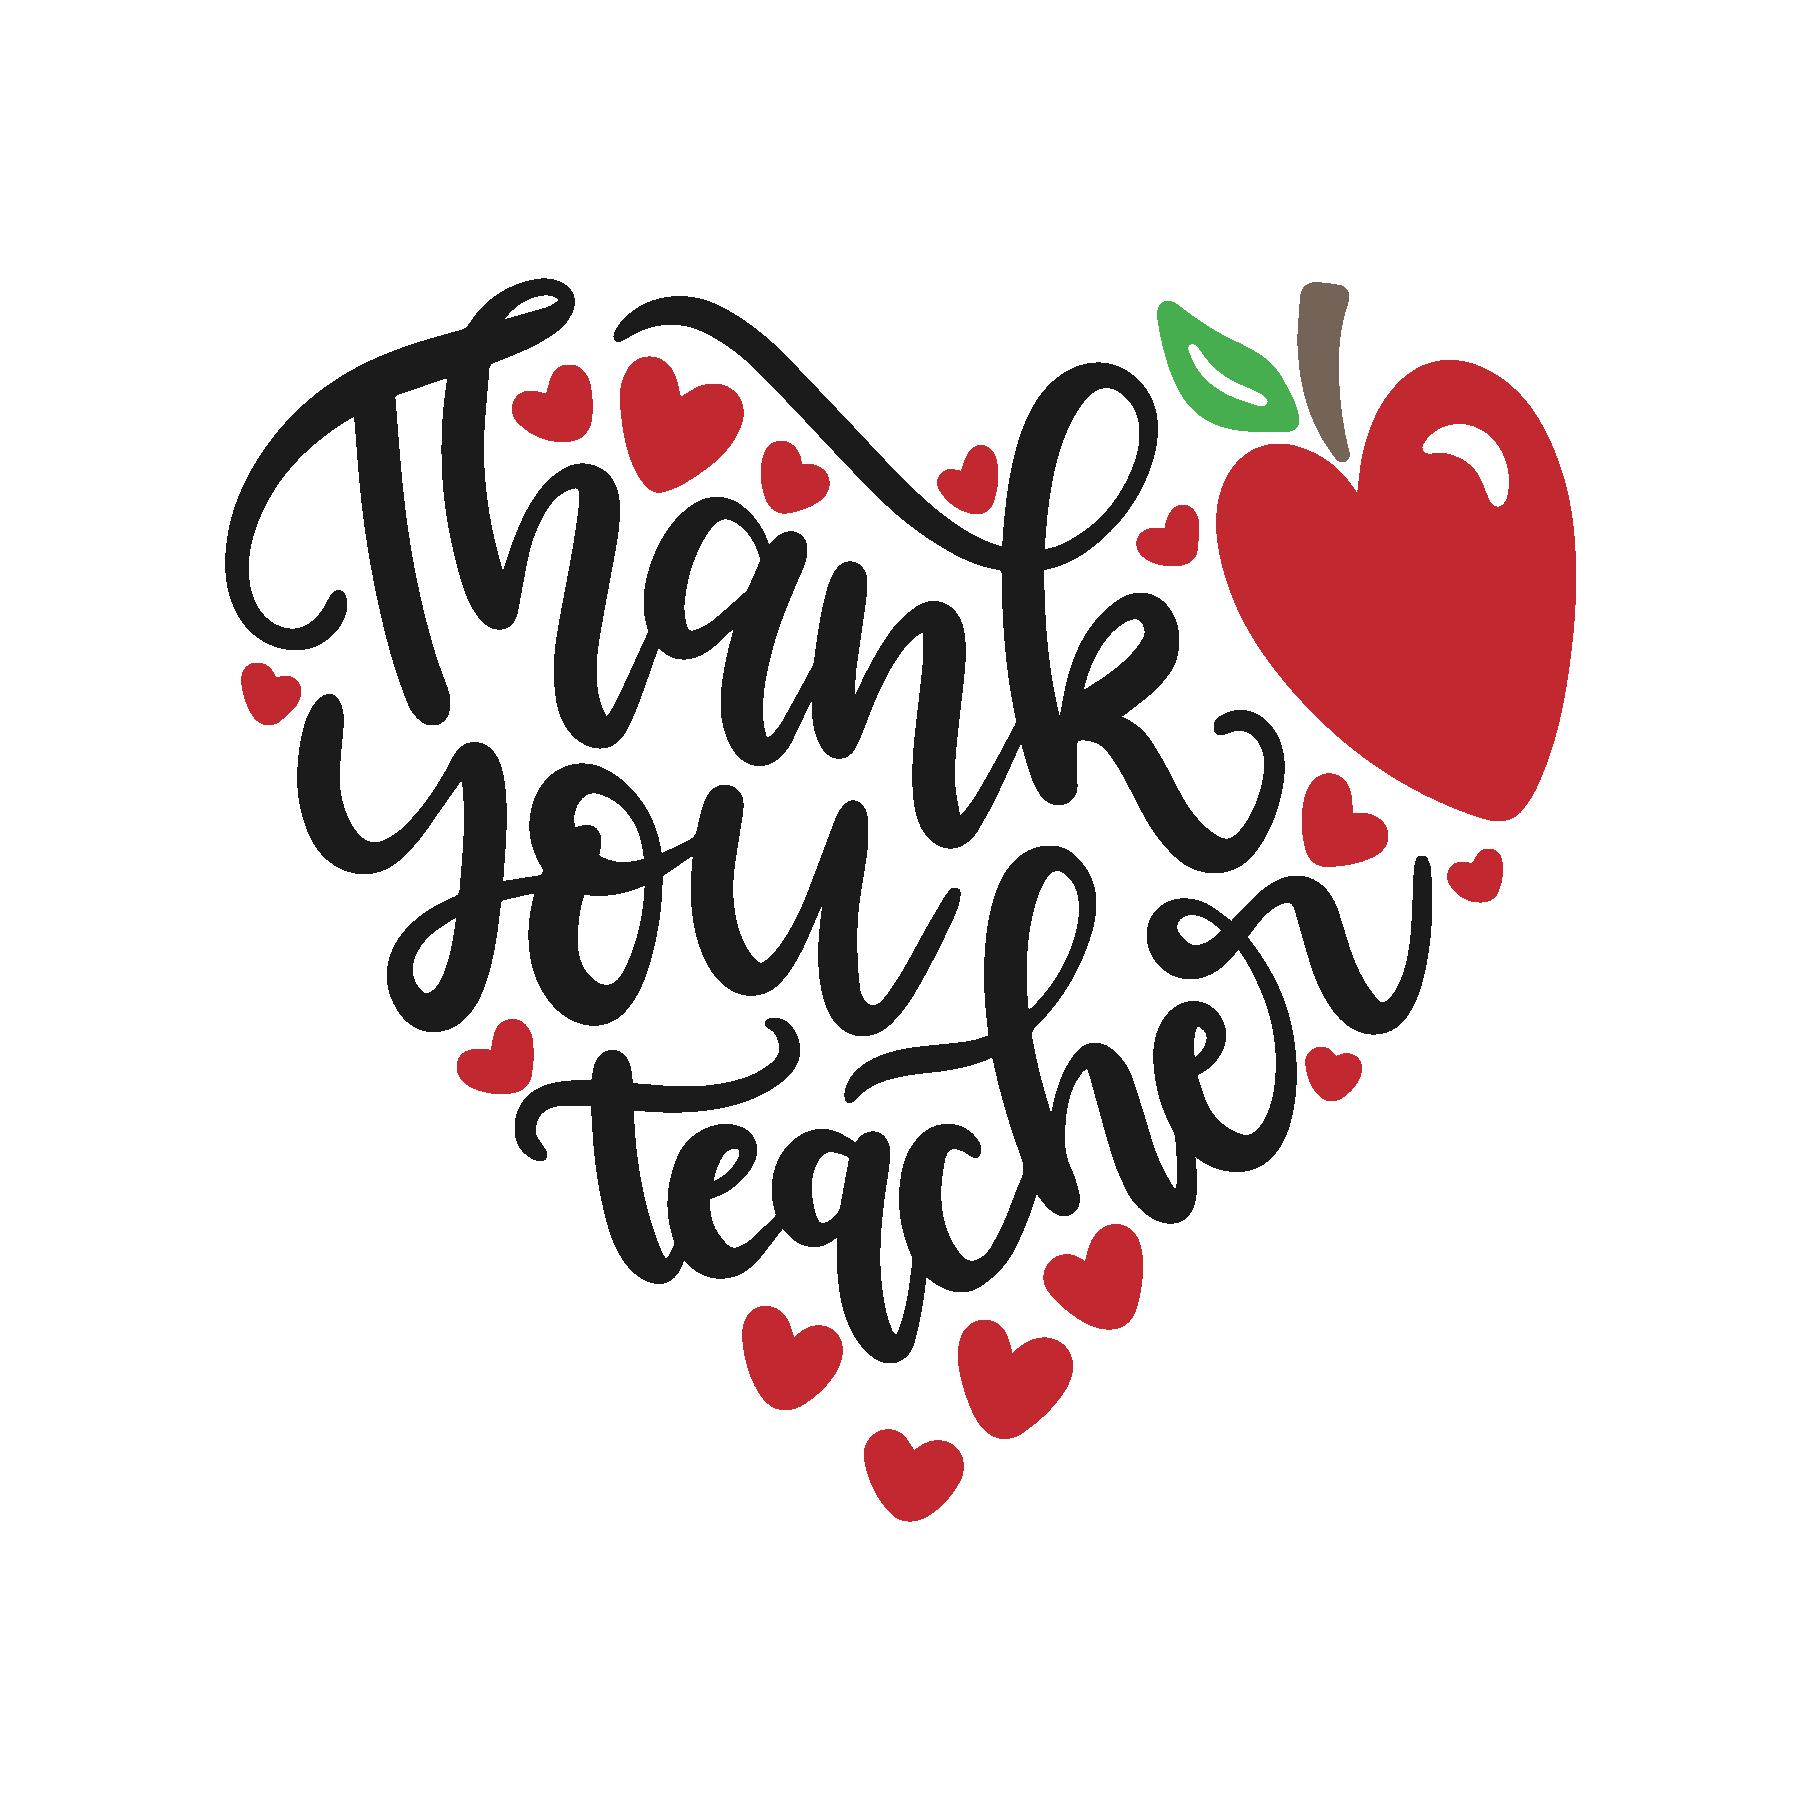 Pin By Marga On Love Svg Teacher Thank You Cards Thanks Teacher Teacher Appreciation Gifts Diy